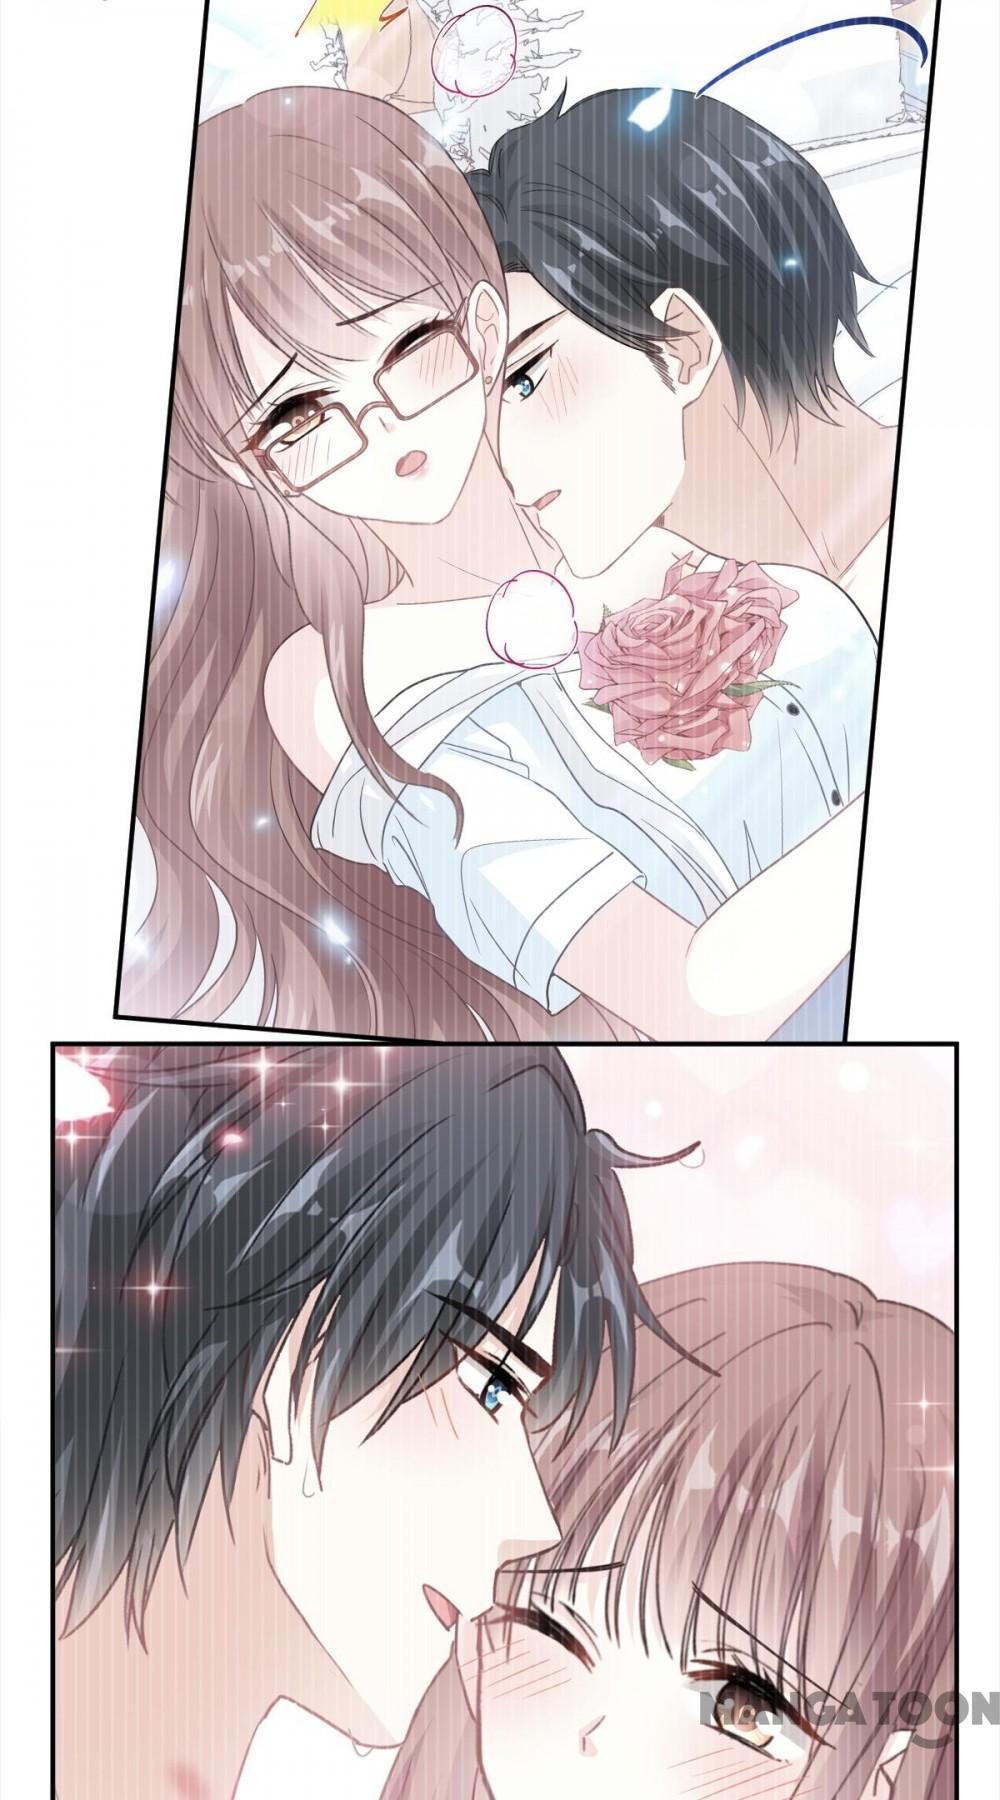 Love Me Gently, Bossy Ceo Chapter 162 page 33 - Mangakakalots.com